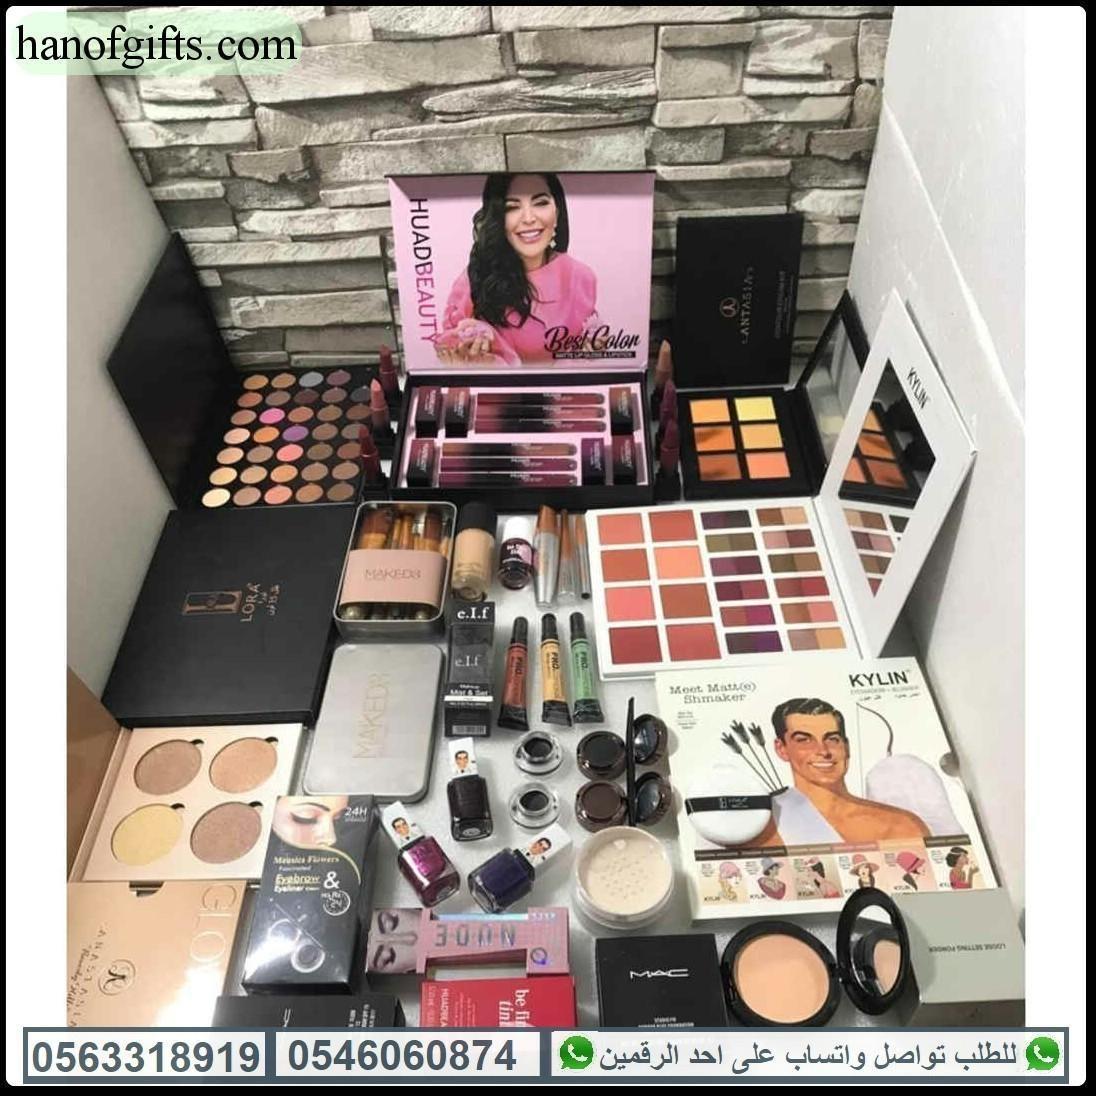 52 67 24 Off عيد الحب صندوق مجوهرات 16 قطعة صابون روز زهرة فتاة المرأة قلادة أحمر الشفاه مخزن للمكياج هدية Gift Box Birthday Storage Gift Makeup Storage